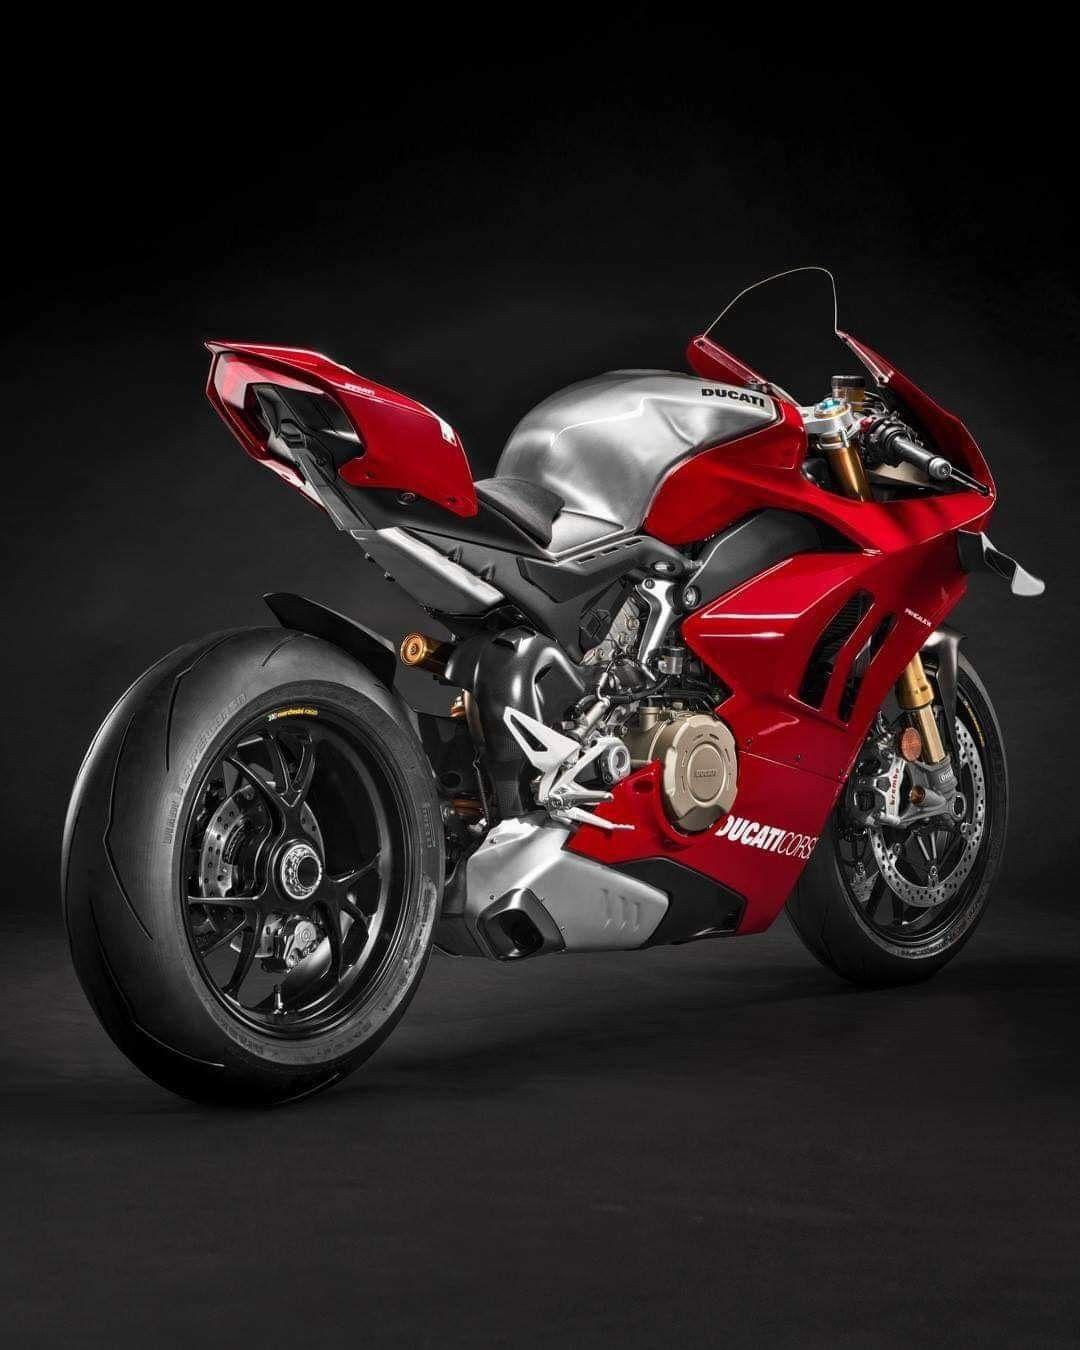 Pin By Enzoso On Ducati Ducati Panigale Ducati Superbike Ducati